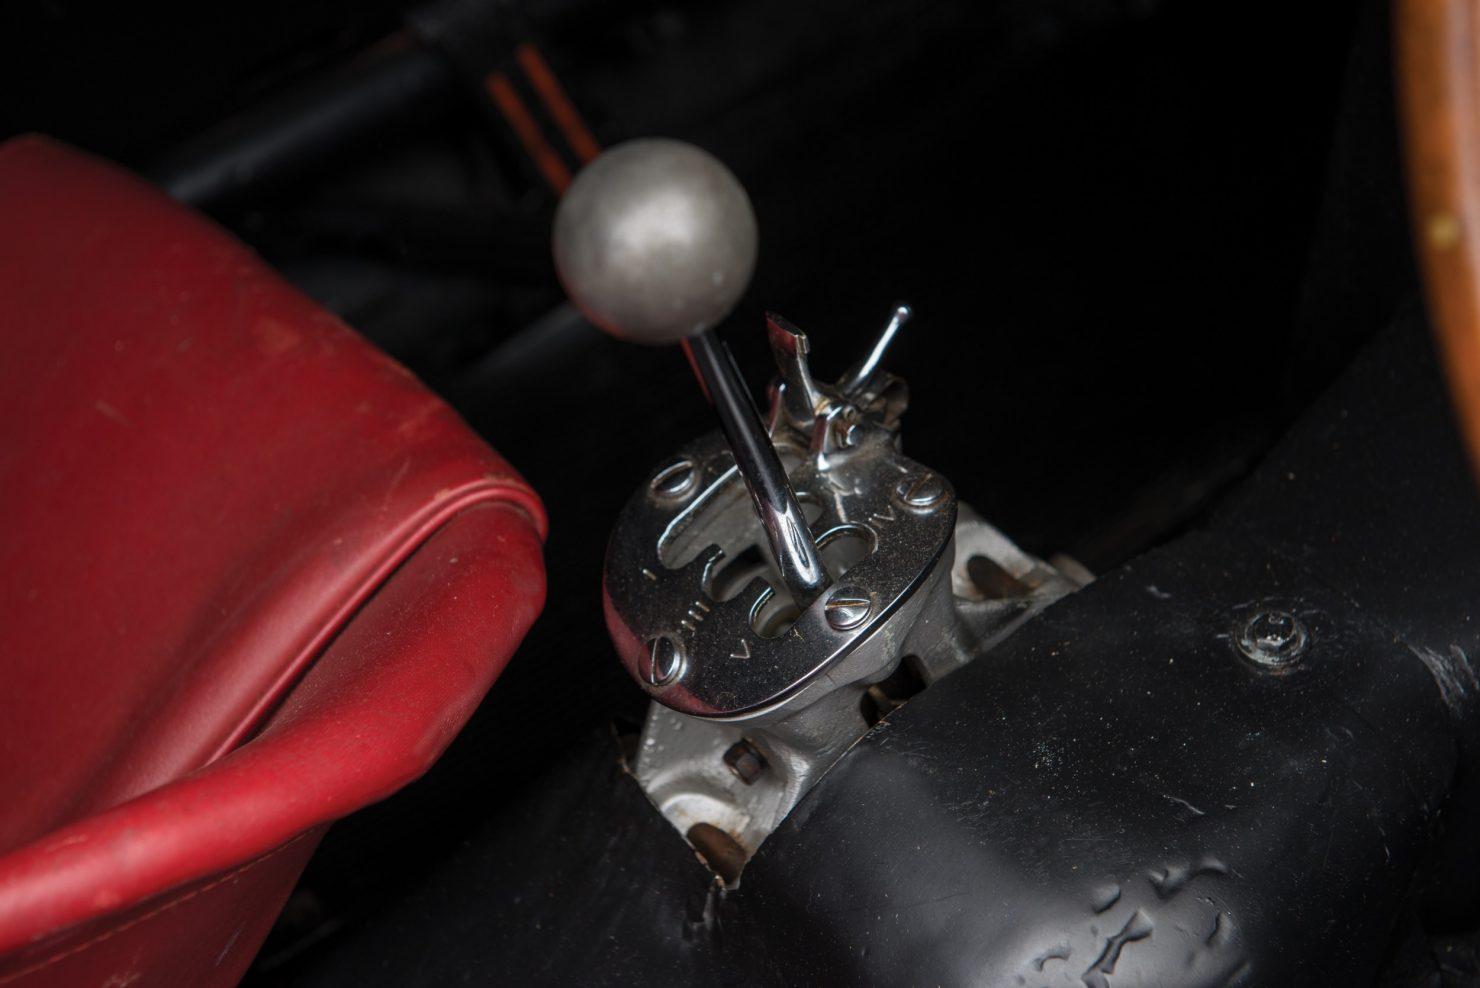 ferrari 121 lm spider 8 1480x988 - 1955 Ferrari 121 LM